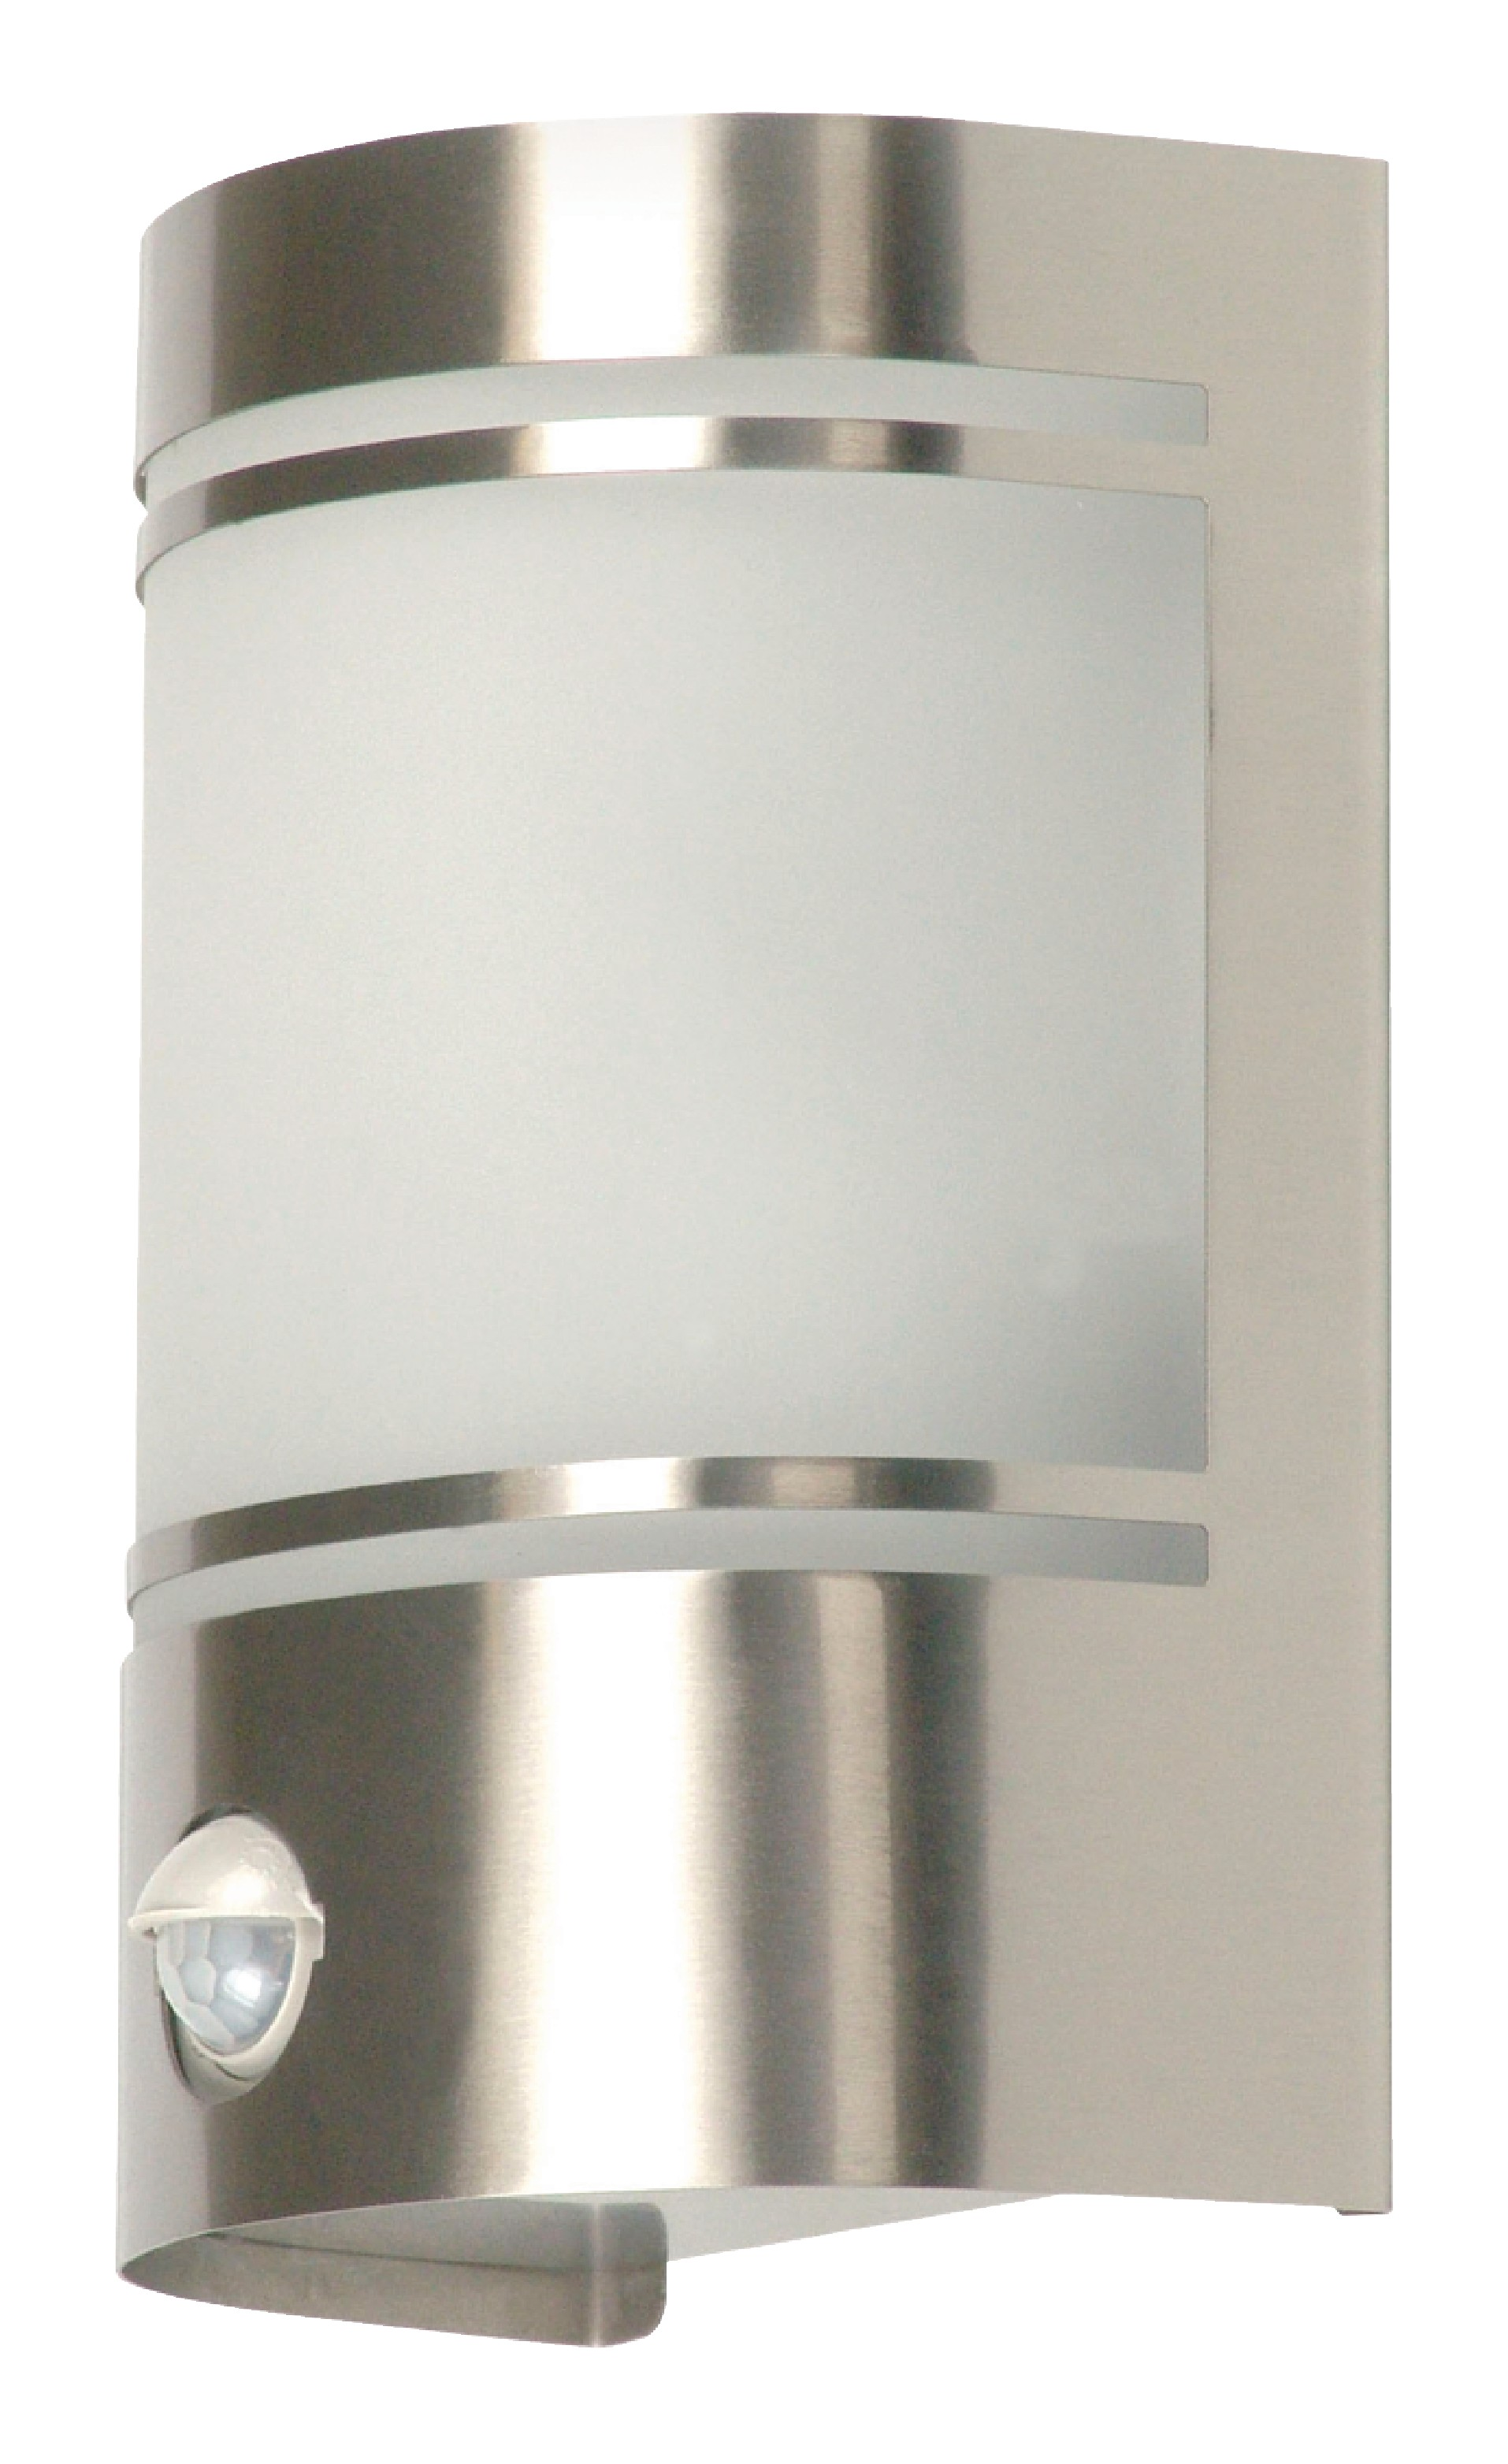 Venkovní nástěnné svítidlo E27 PIR Ranex RA-5000299